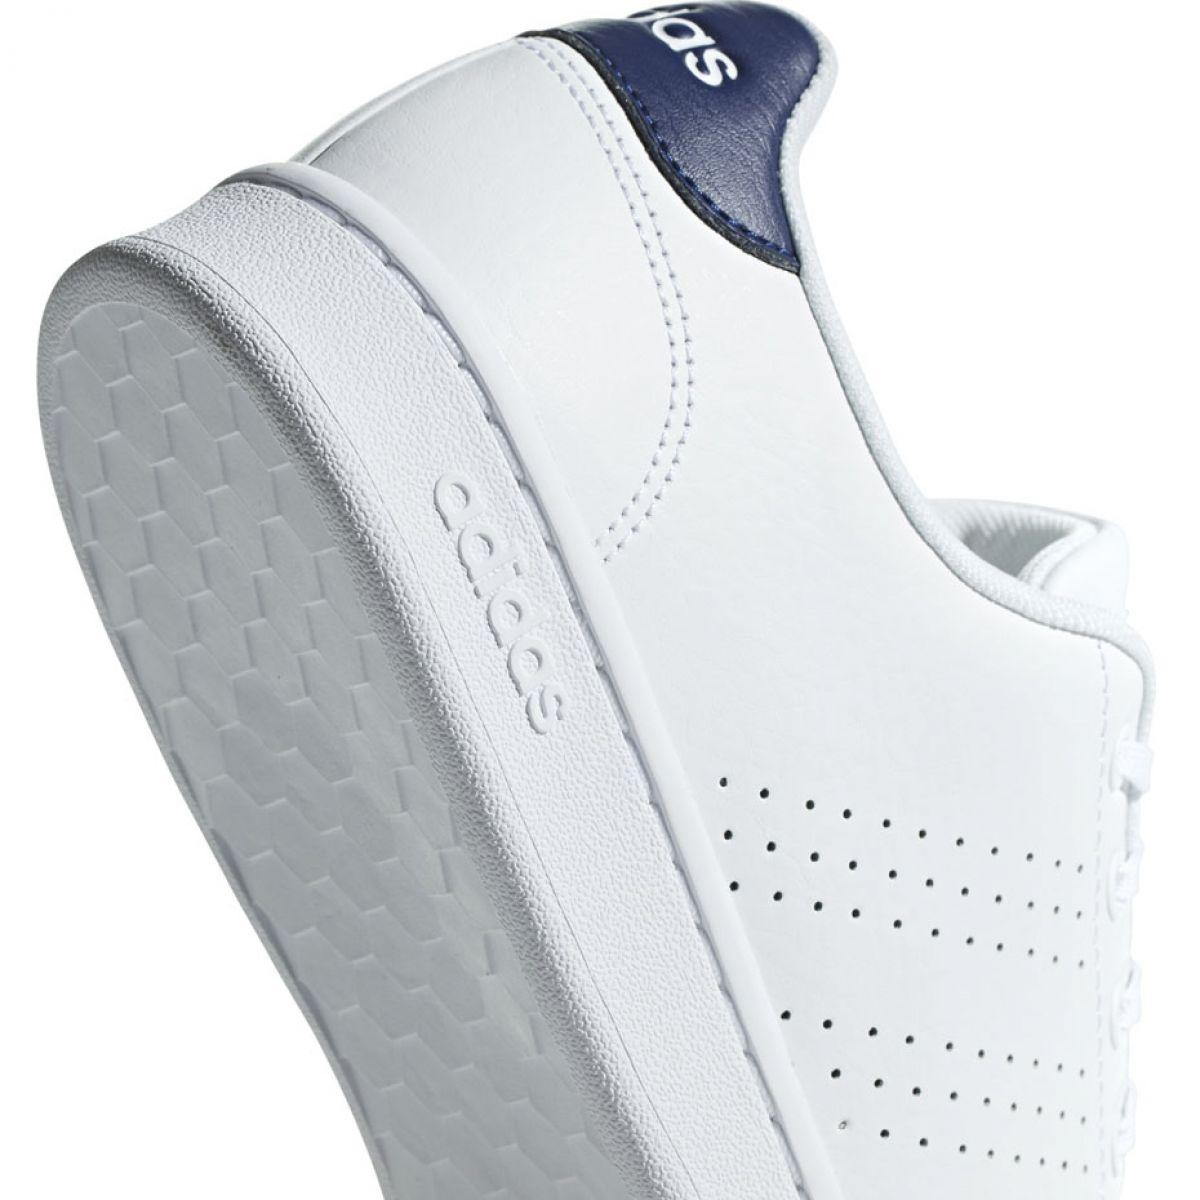 Adidas Advantage M F36423 shoes white